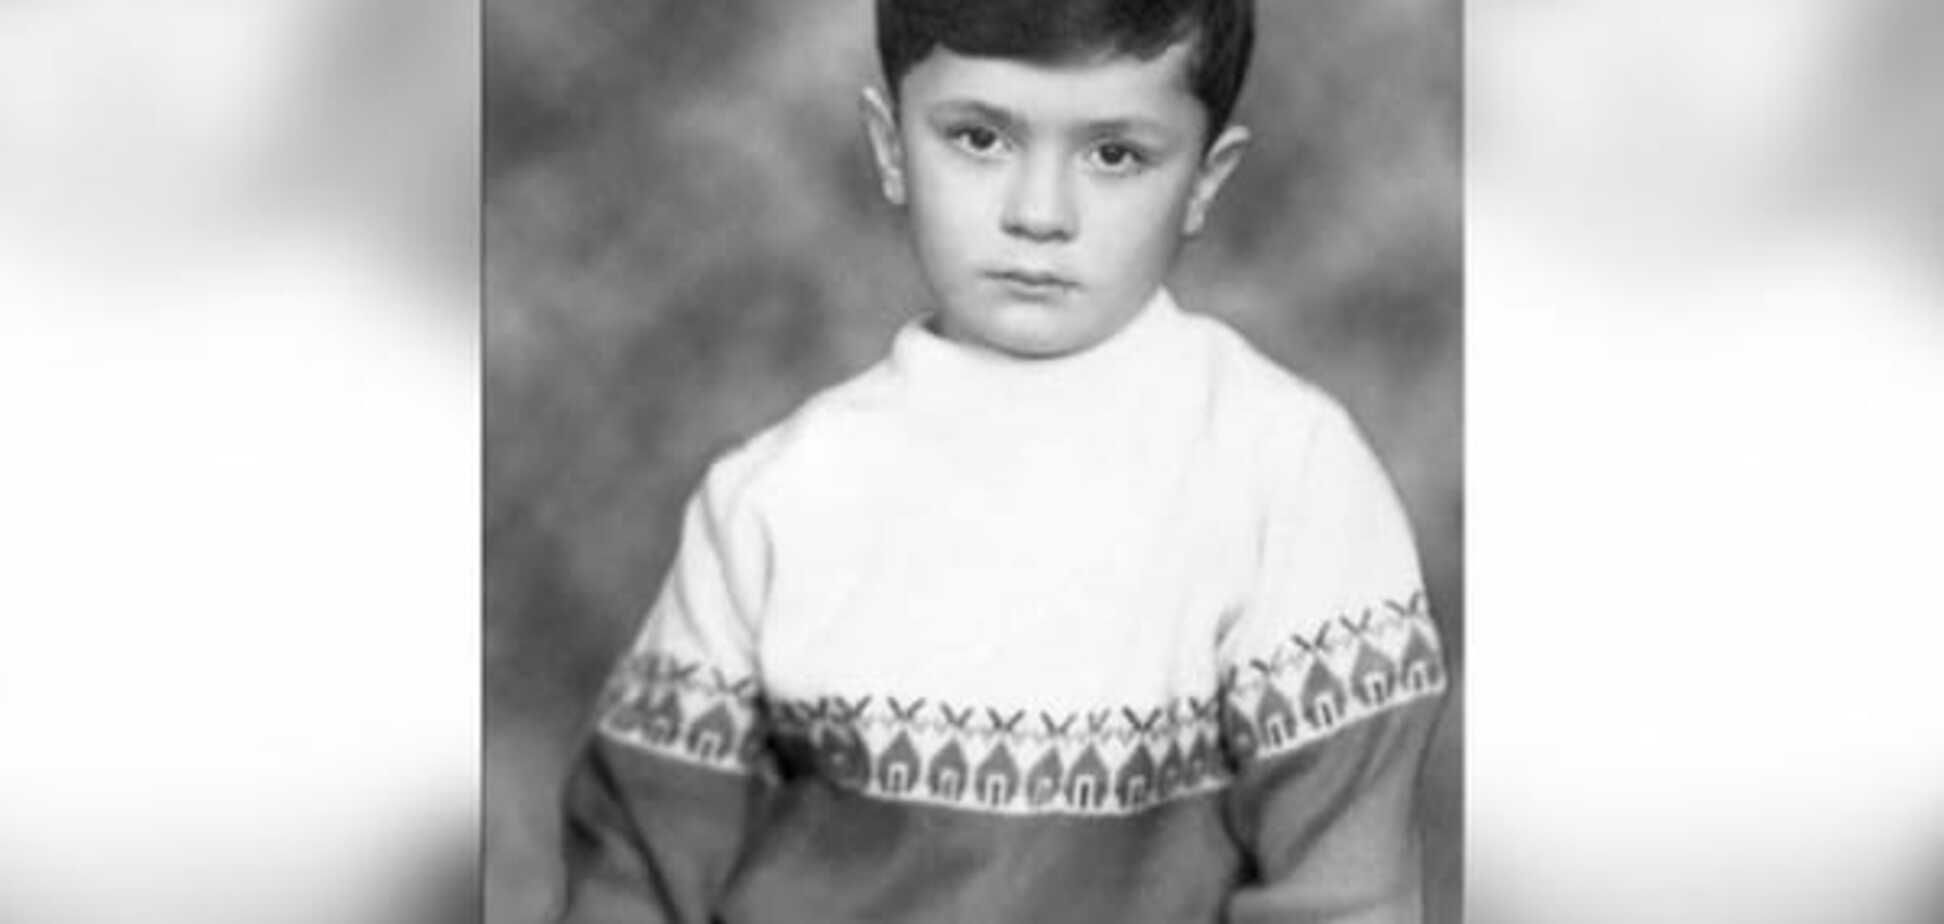 Одноклассники Порошенко рассказали о его прозвище и шапке-ушанке